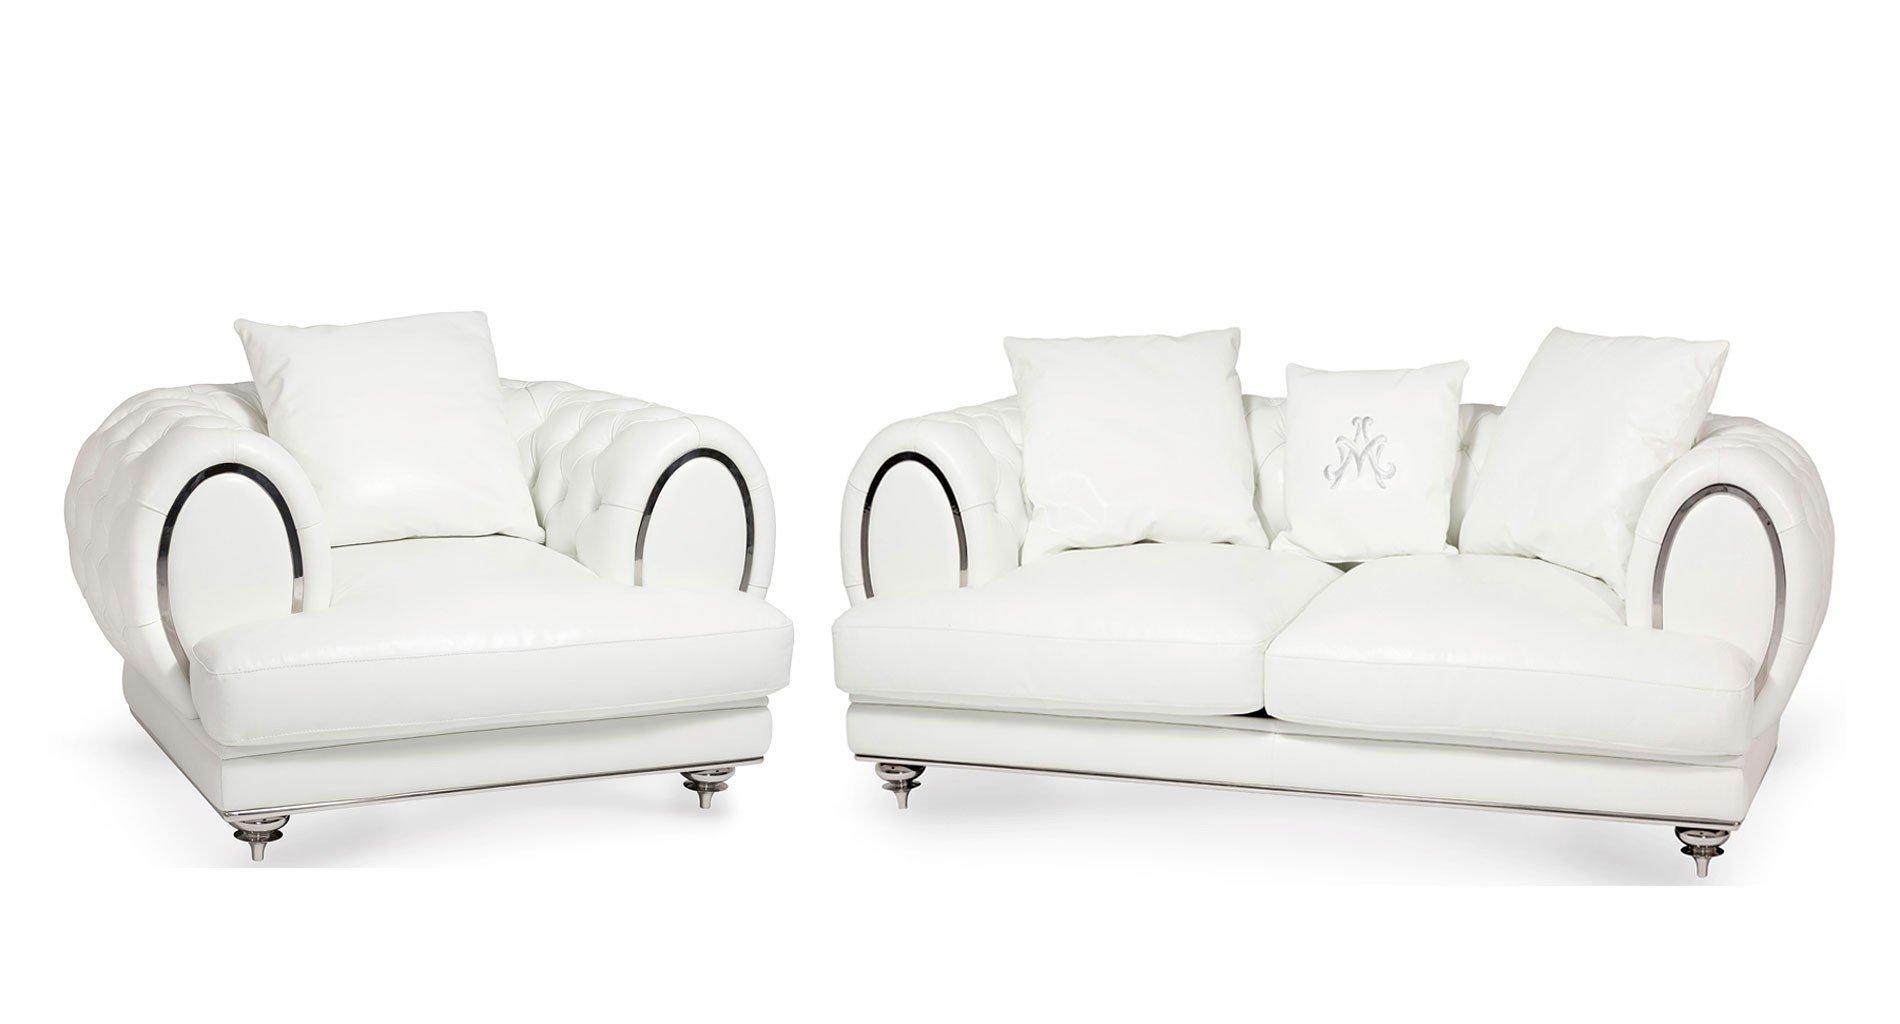 Mia Bella Ellia Leather Living Room Set (Frosted Cream)